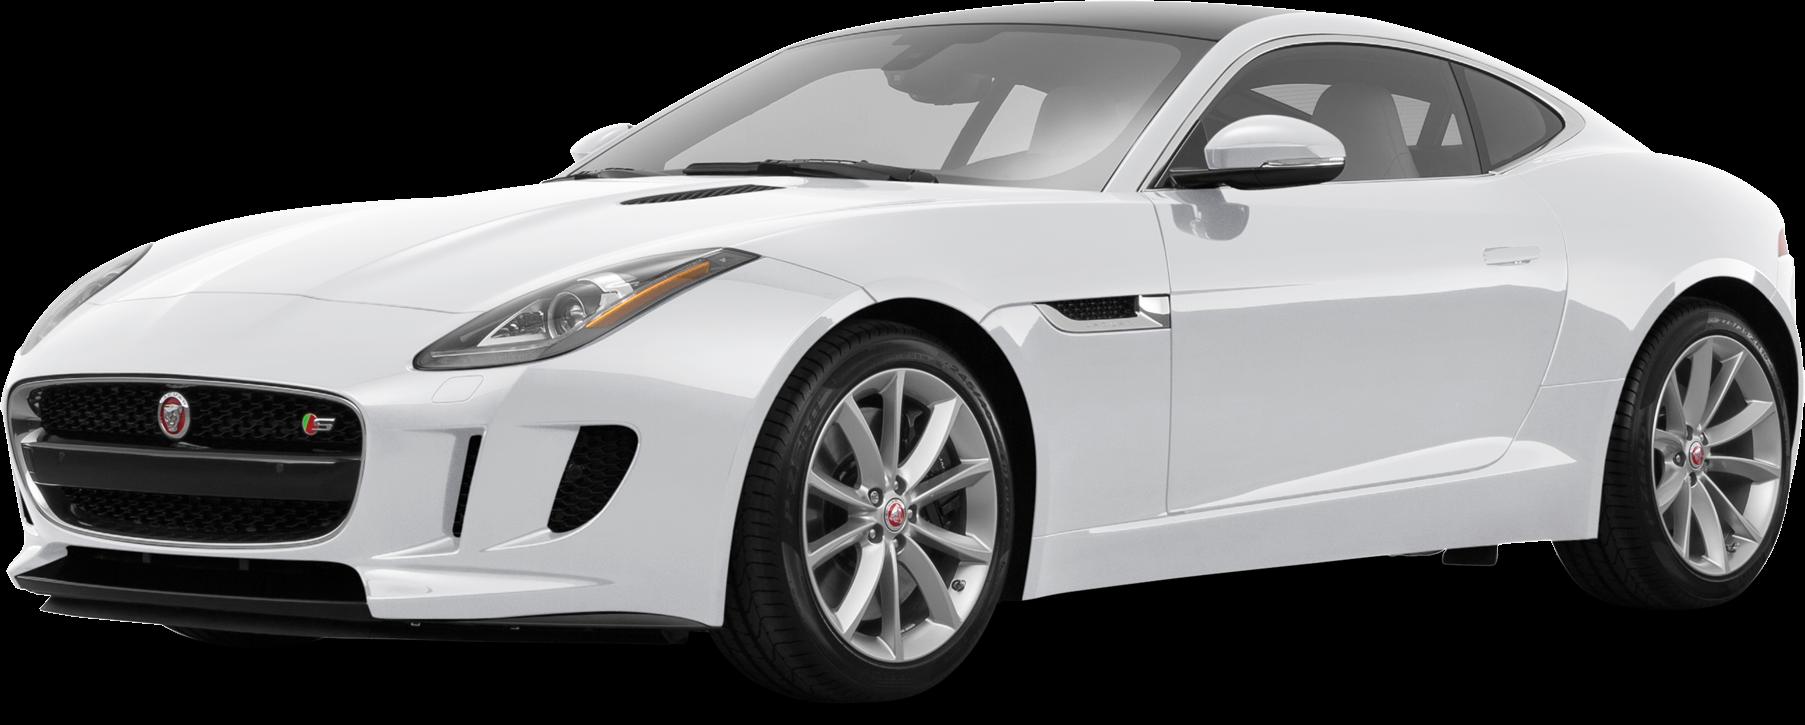 2016 Chevrolet Corvette | Pricing, Ratings, Expert Review